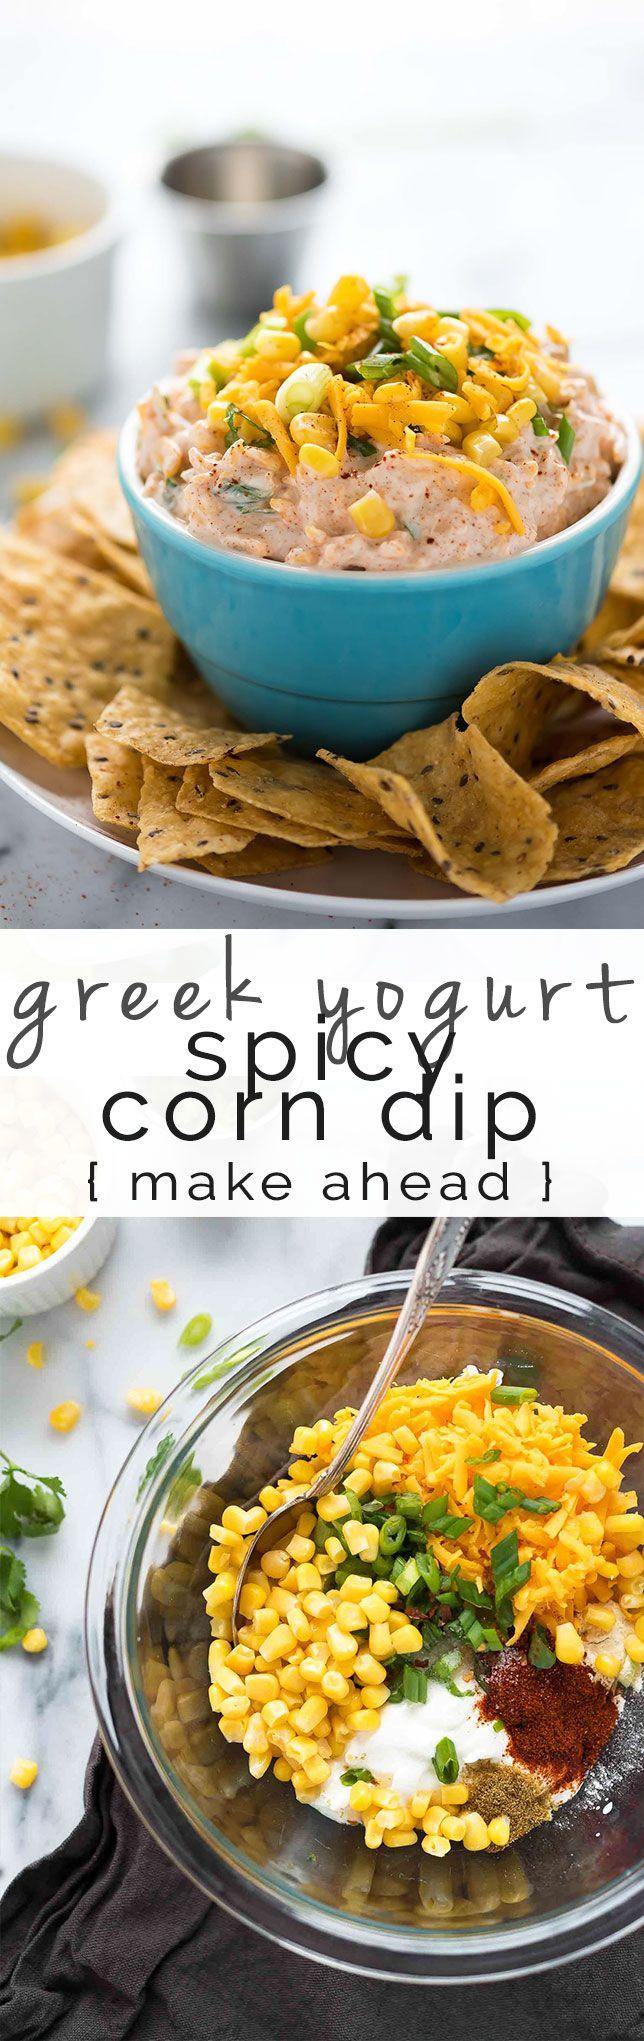 Spicy corn dip, cold, hot, recipe, easy, parties, tortilla chips, super bowl, greek yogurt, snacks, healthy, gluten free